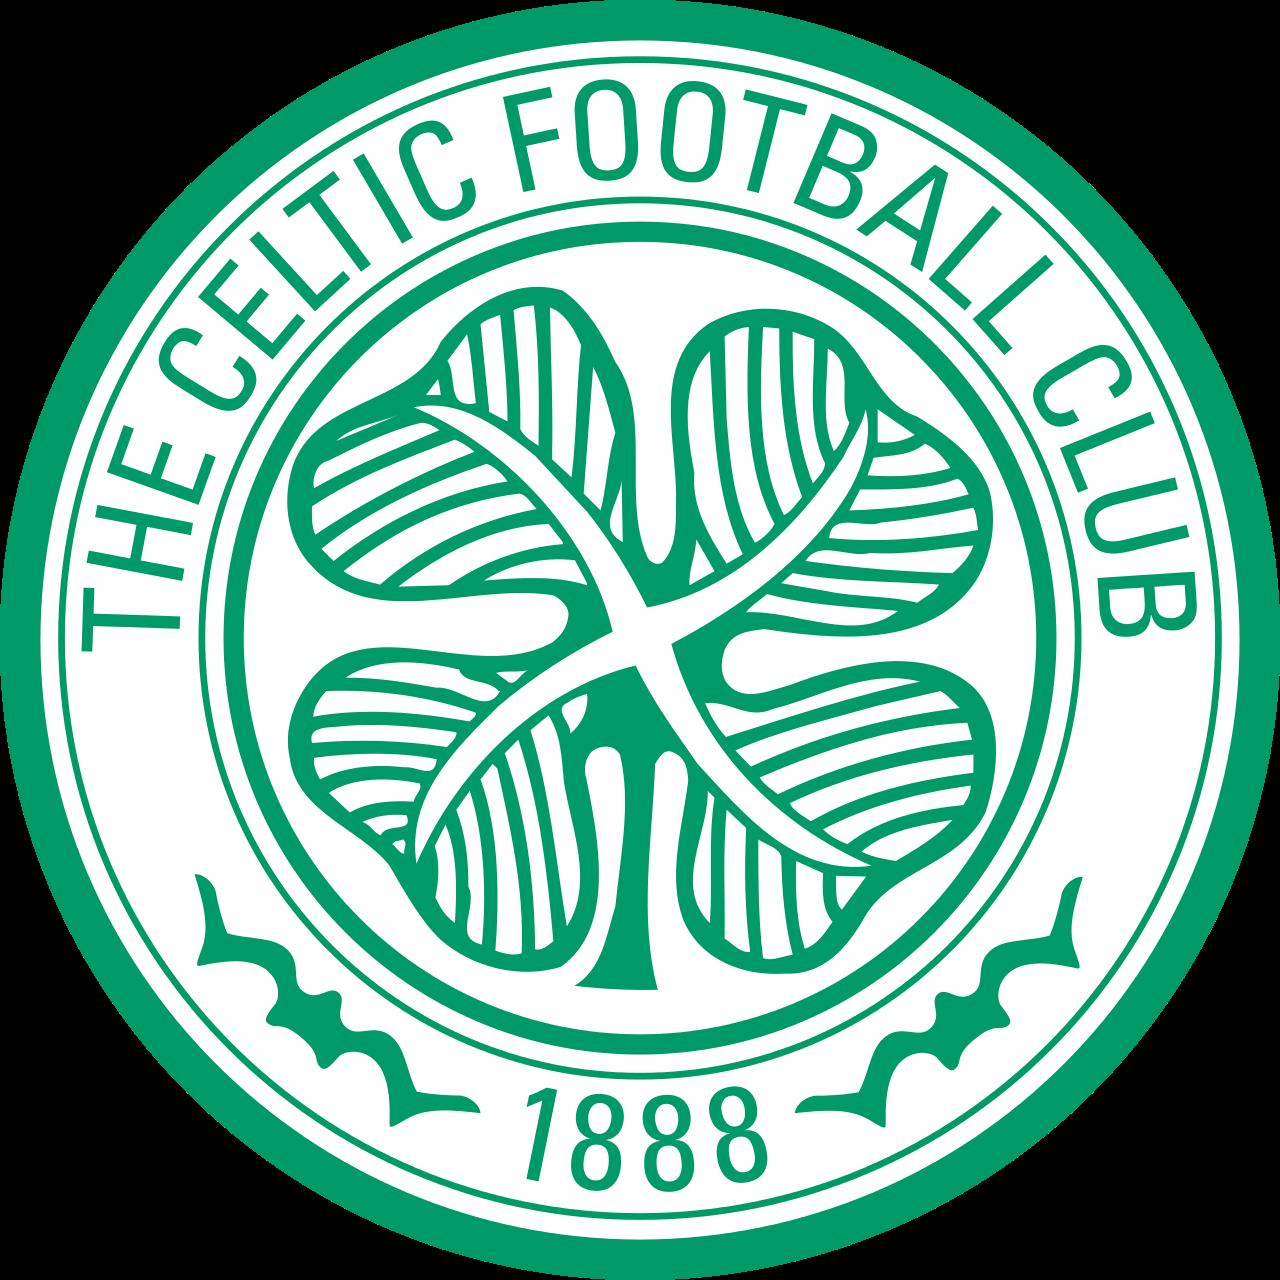 Celtic Football Club - Wikipedia